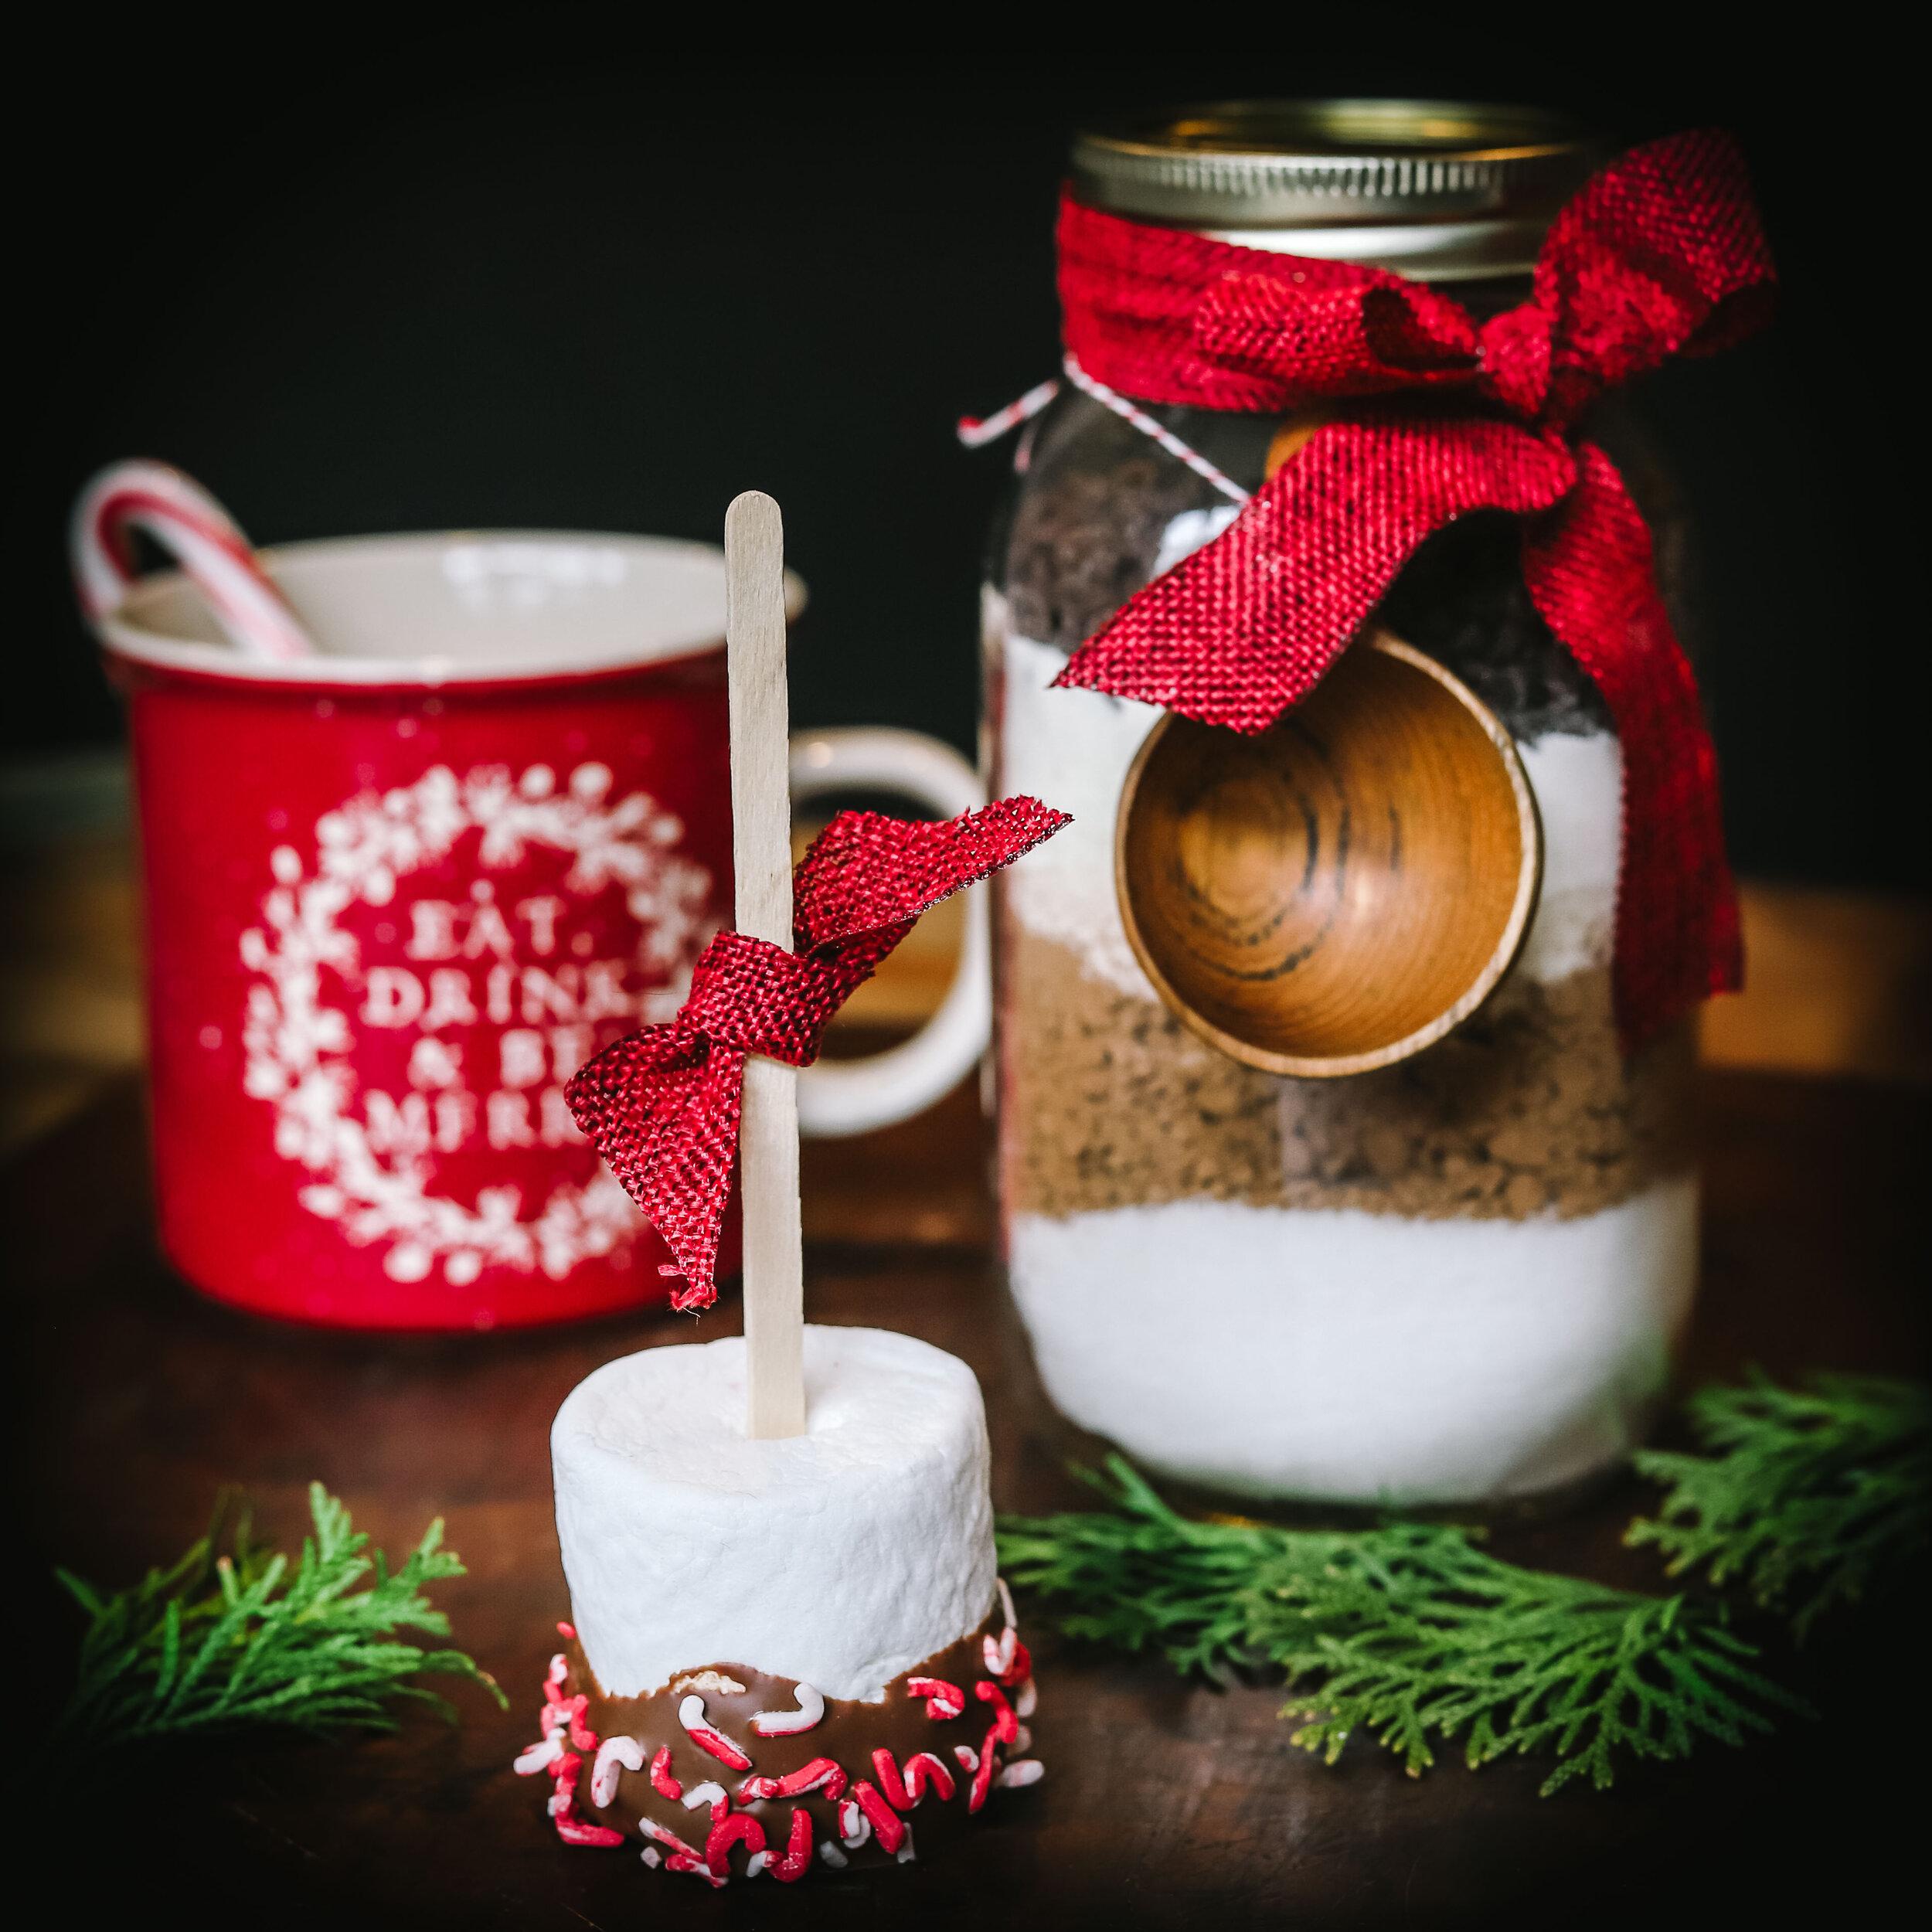 Recipe And Steps For Crafting Mason Jar Hot Chocolate Fox 4 Kansas City Wdaf Tv News Weather Sports